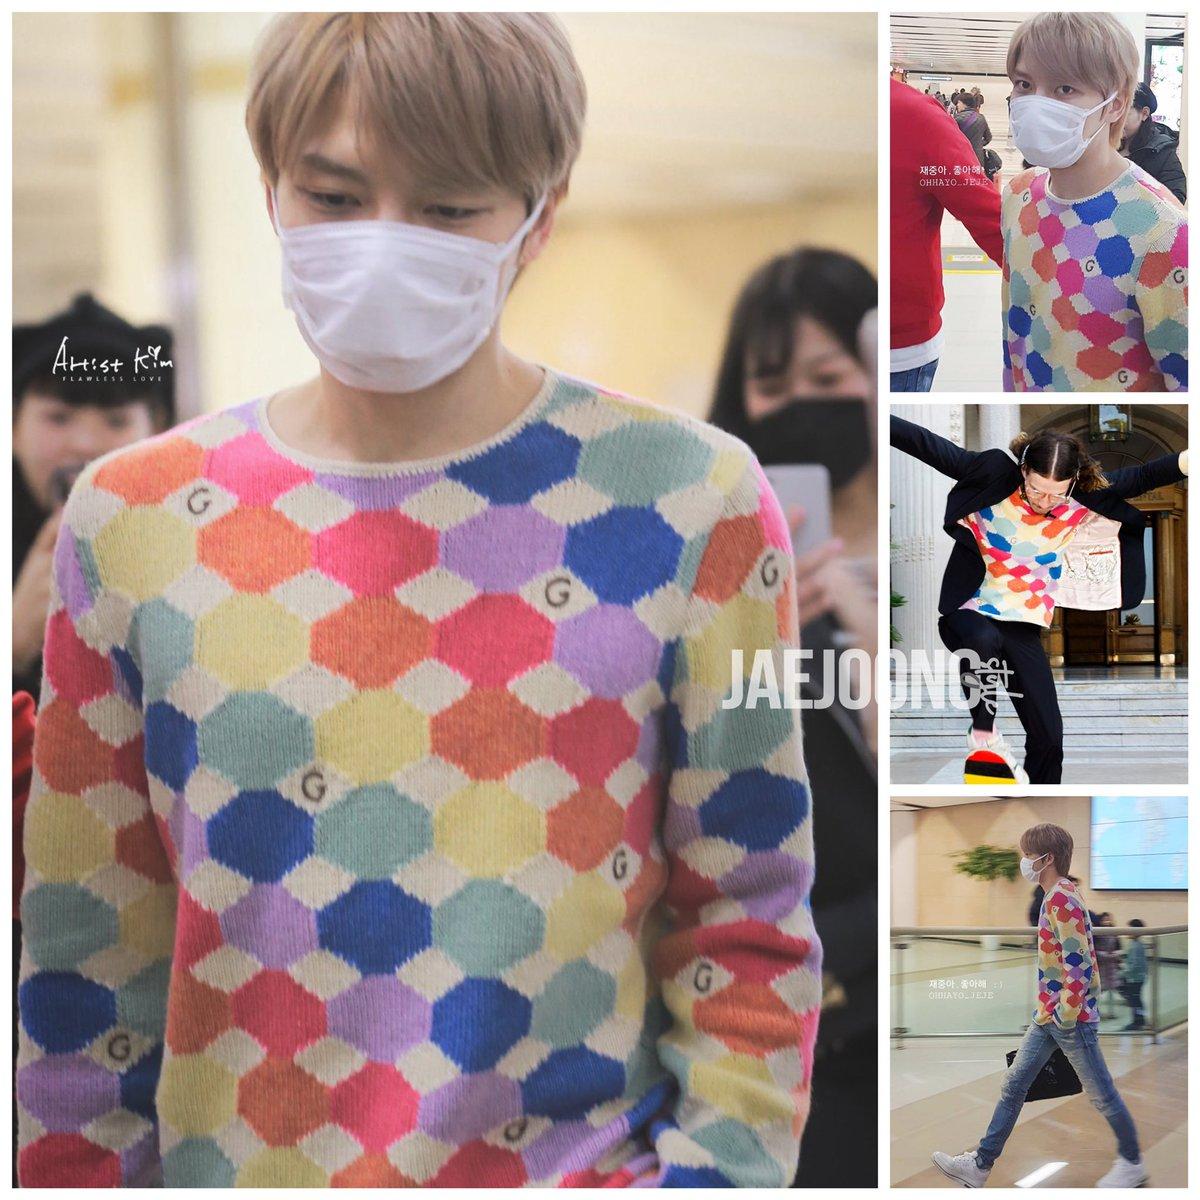 best sneakers 6727e d23ba 2019.03.04ジェジュン金浦空港ファッション GUCCIのセーター ...